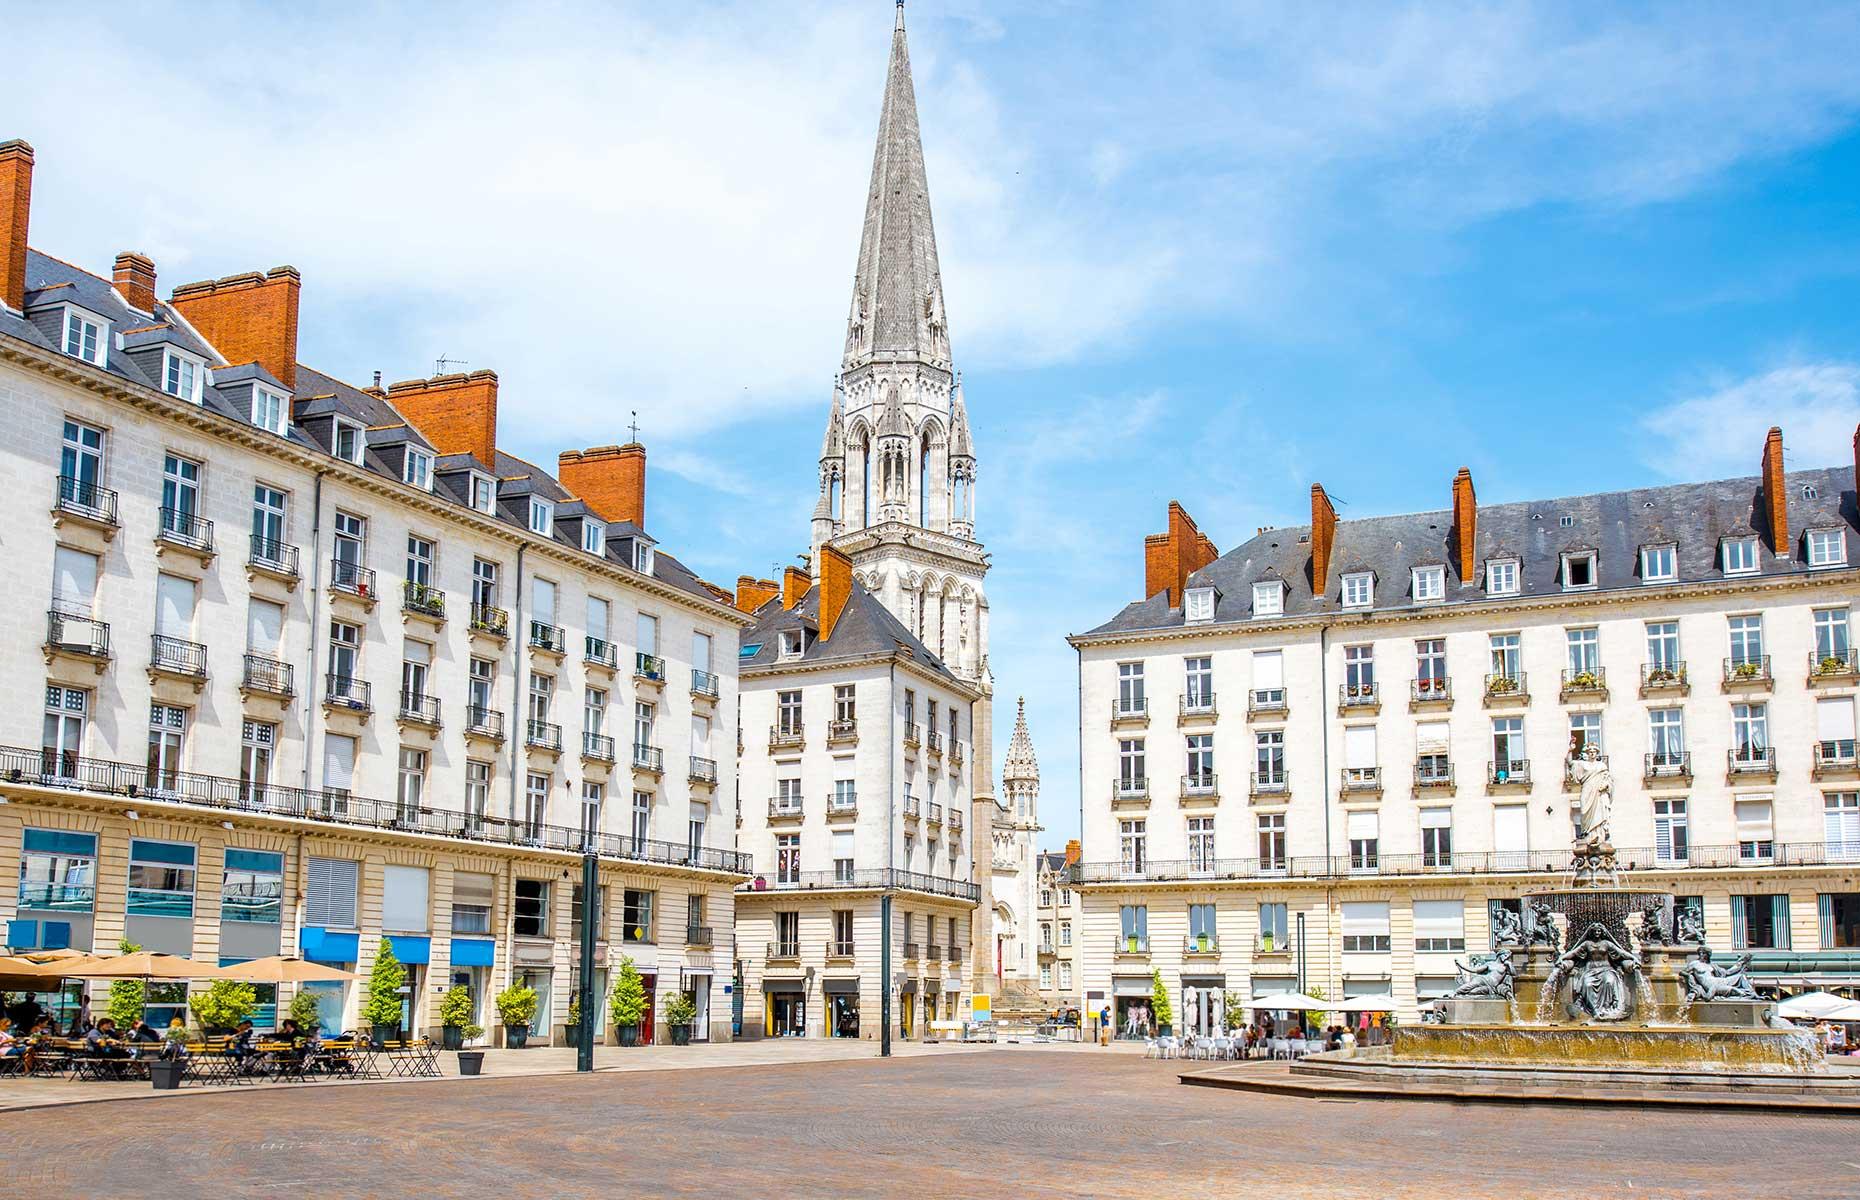 Matrimoniale NANTES | Barbati si femei din Loire-Atlantique | kostantin.ro